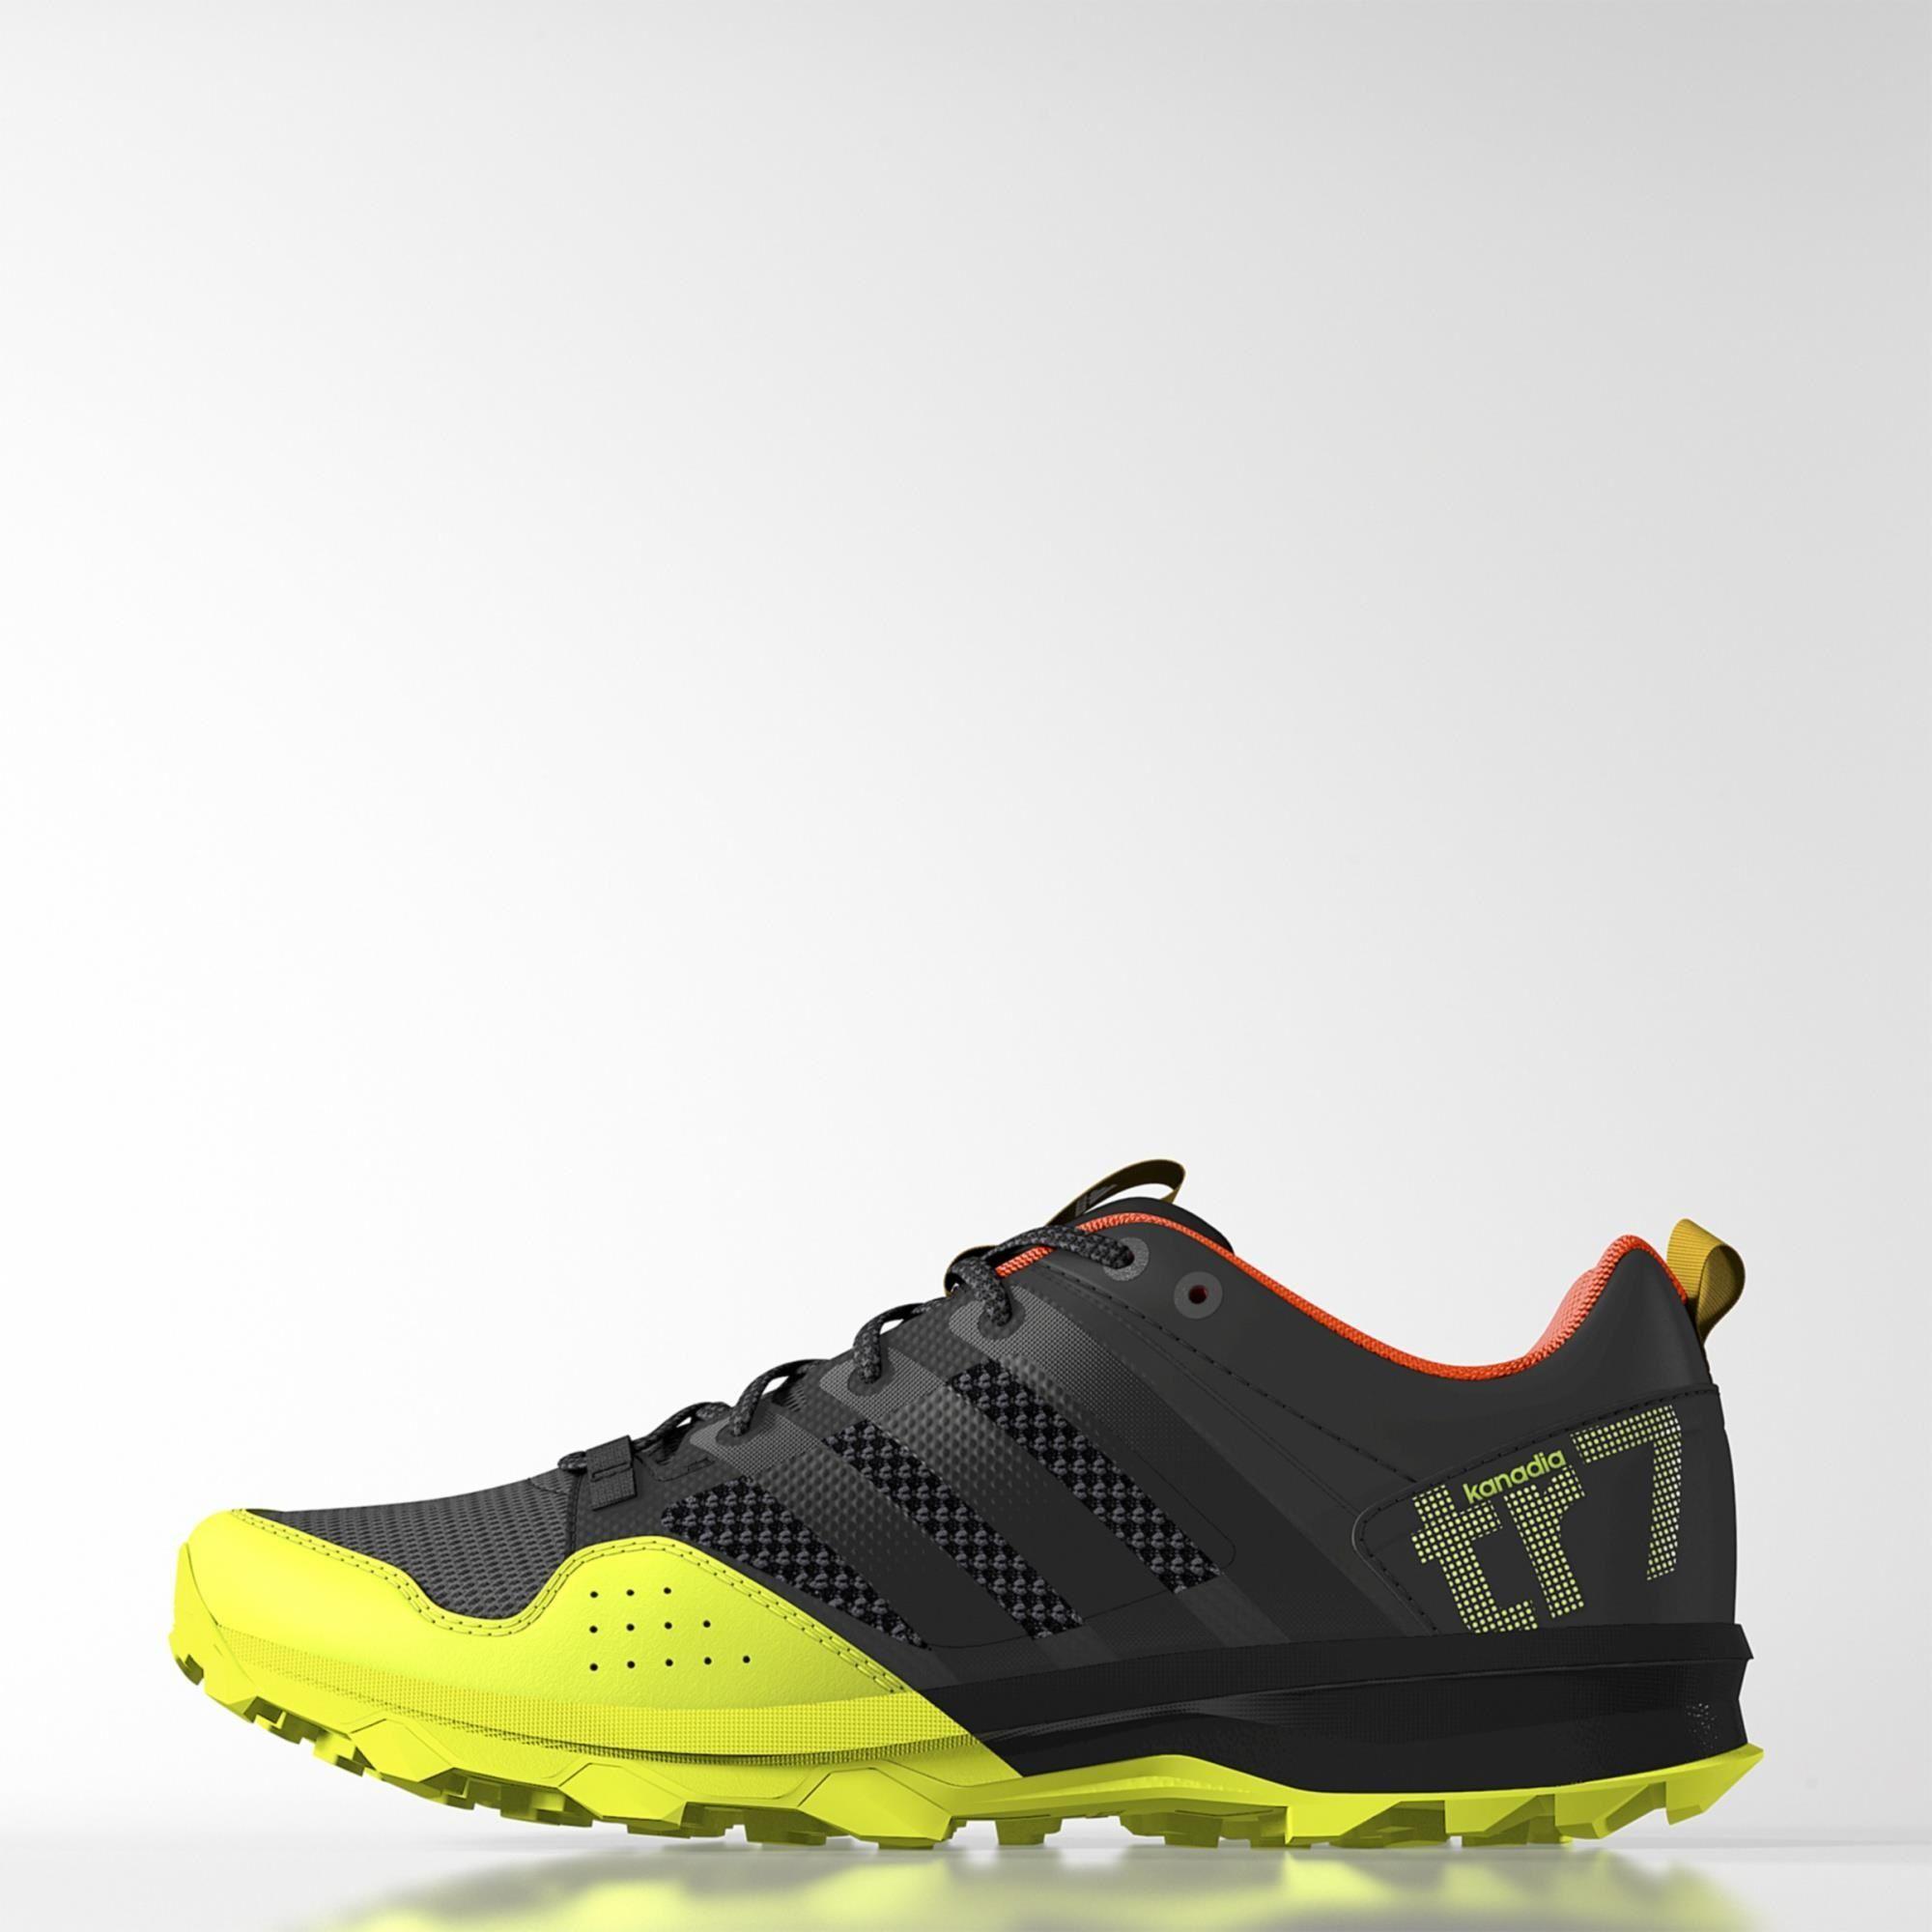 promo code c25aa e8141 Chaussure Kanadia 7 Trail - noir adidas   adidas France